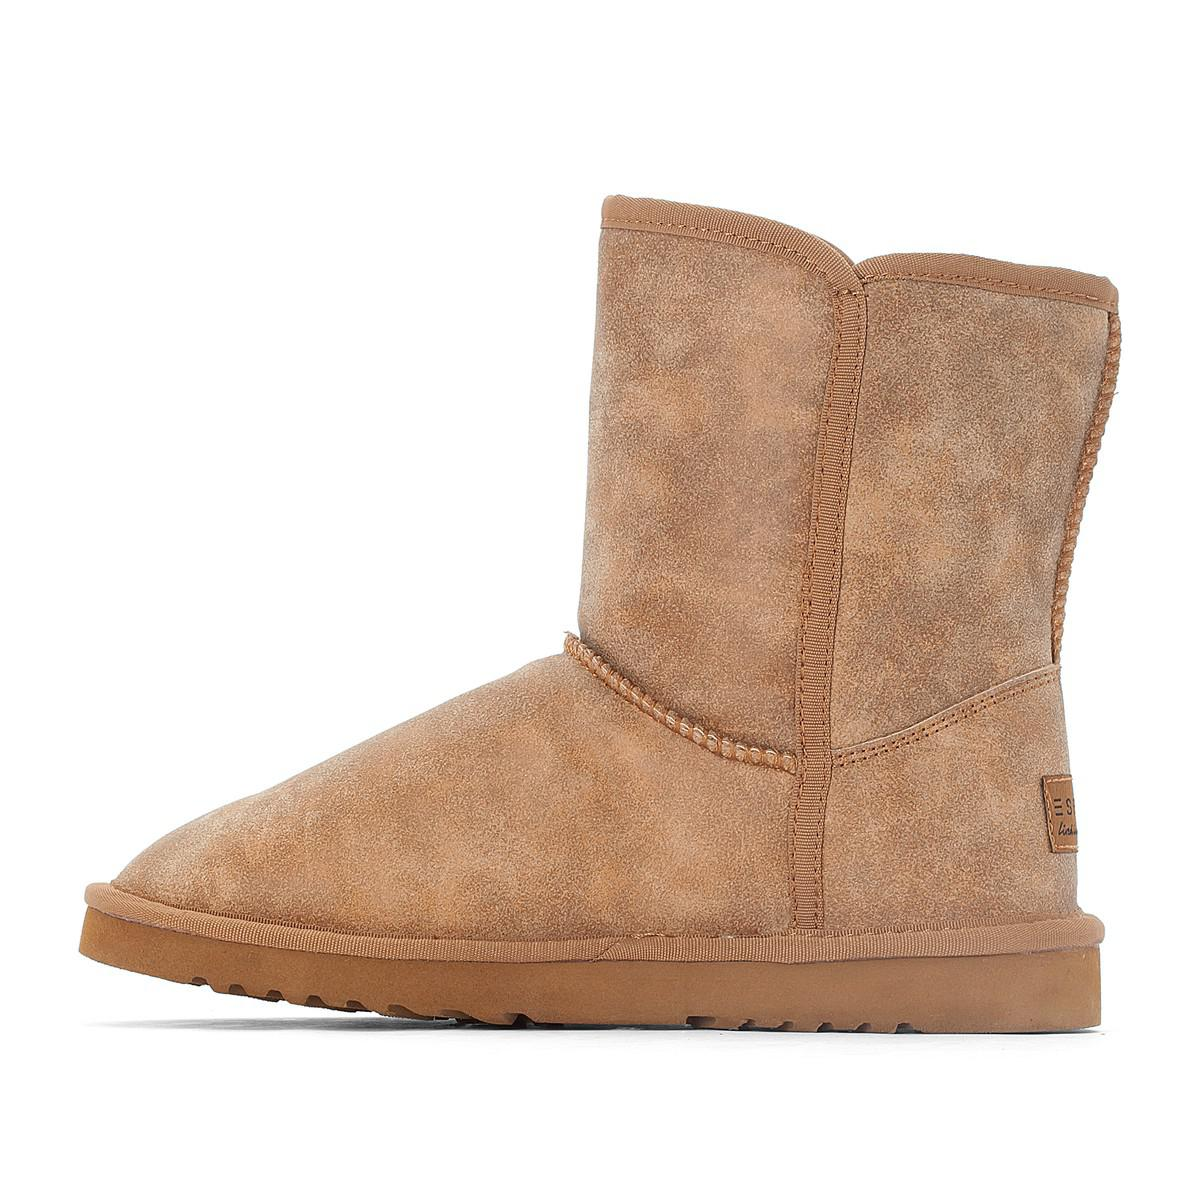 esprit boots fourr es uma in brown lyst. Black Bedroom Furniture Sets. Home Design Ideas